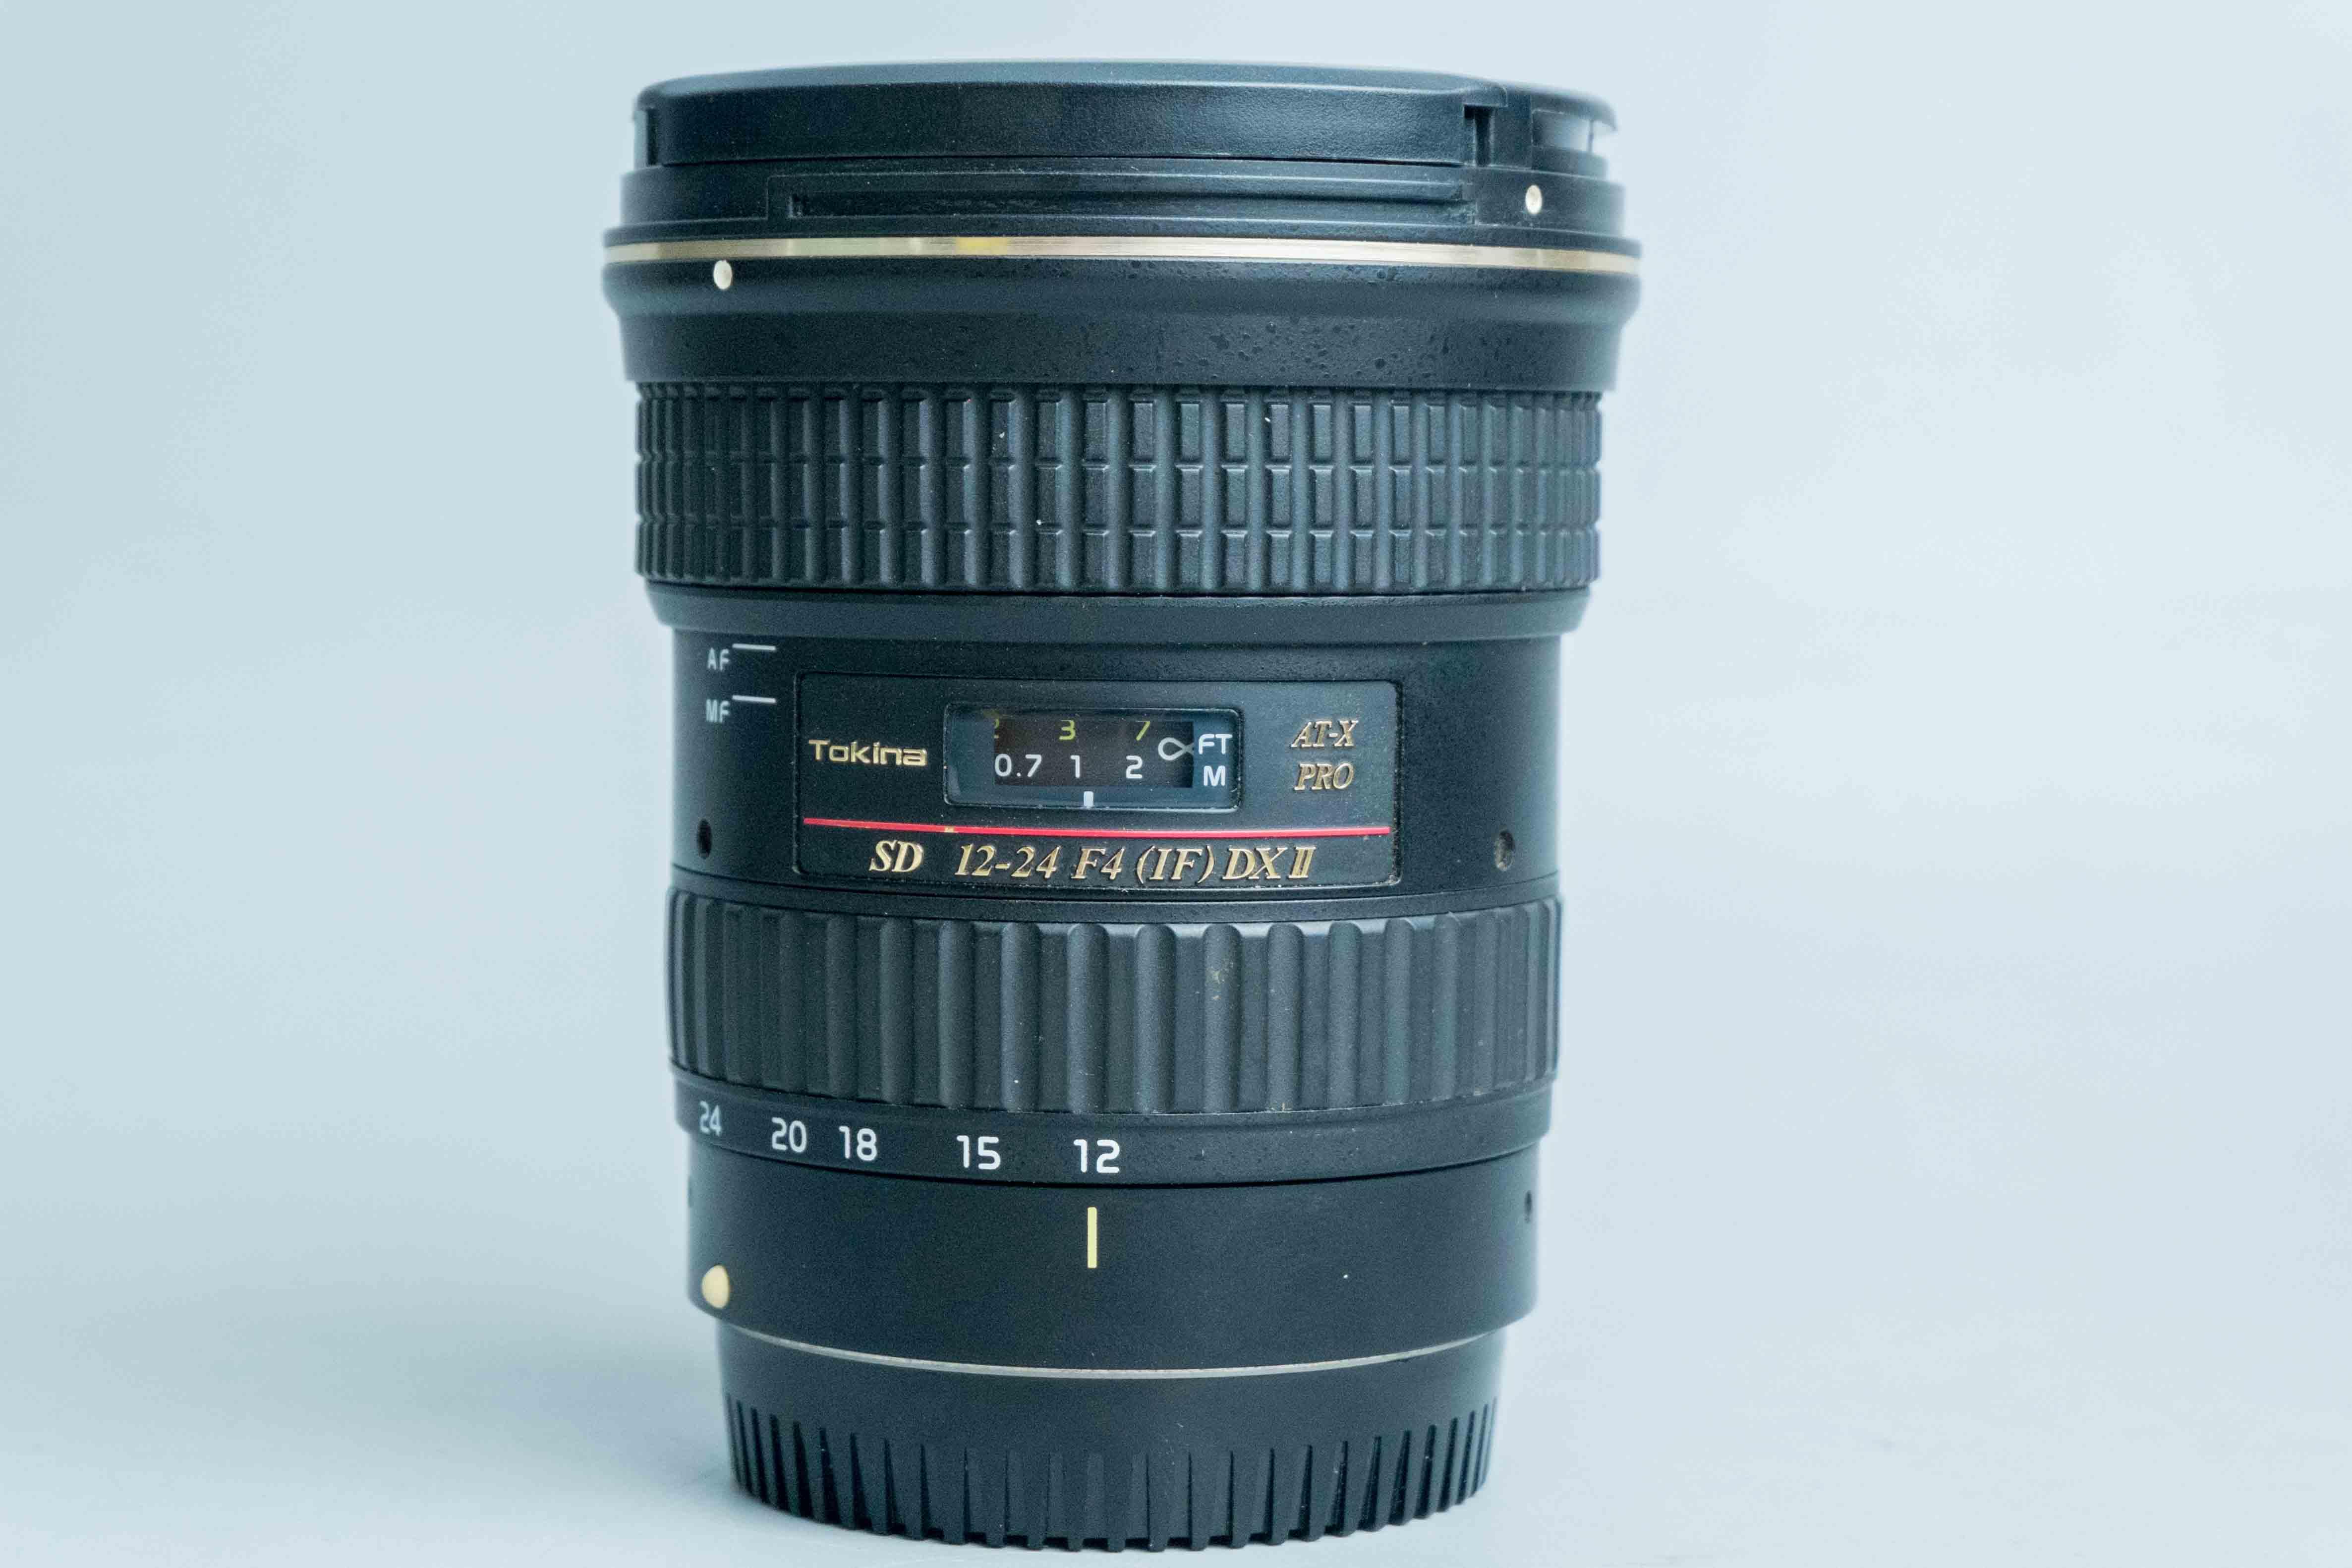 tokina-12-24mm-f4-0-ii-af-canon-tokina-12-24-4-0-12927